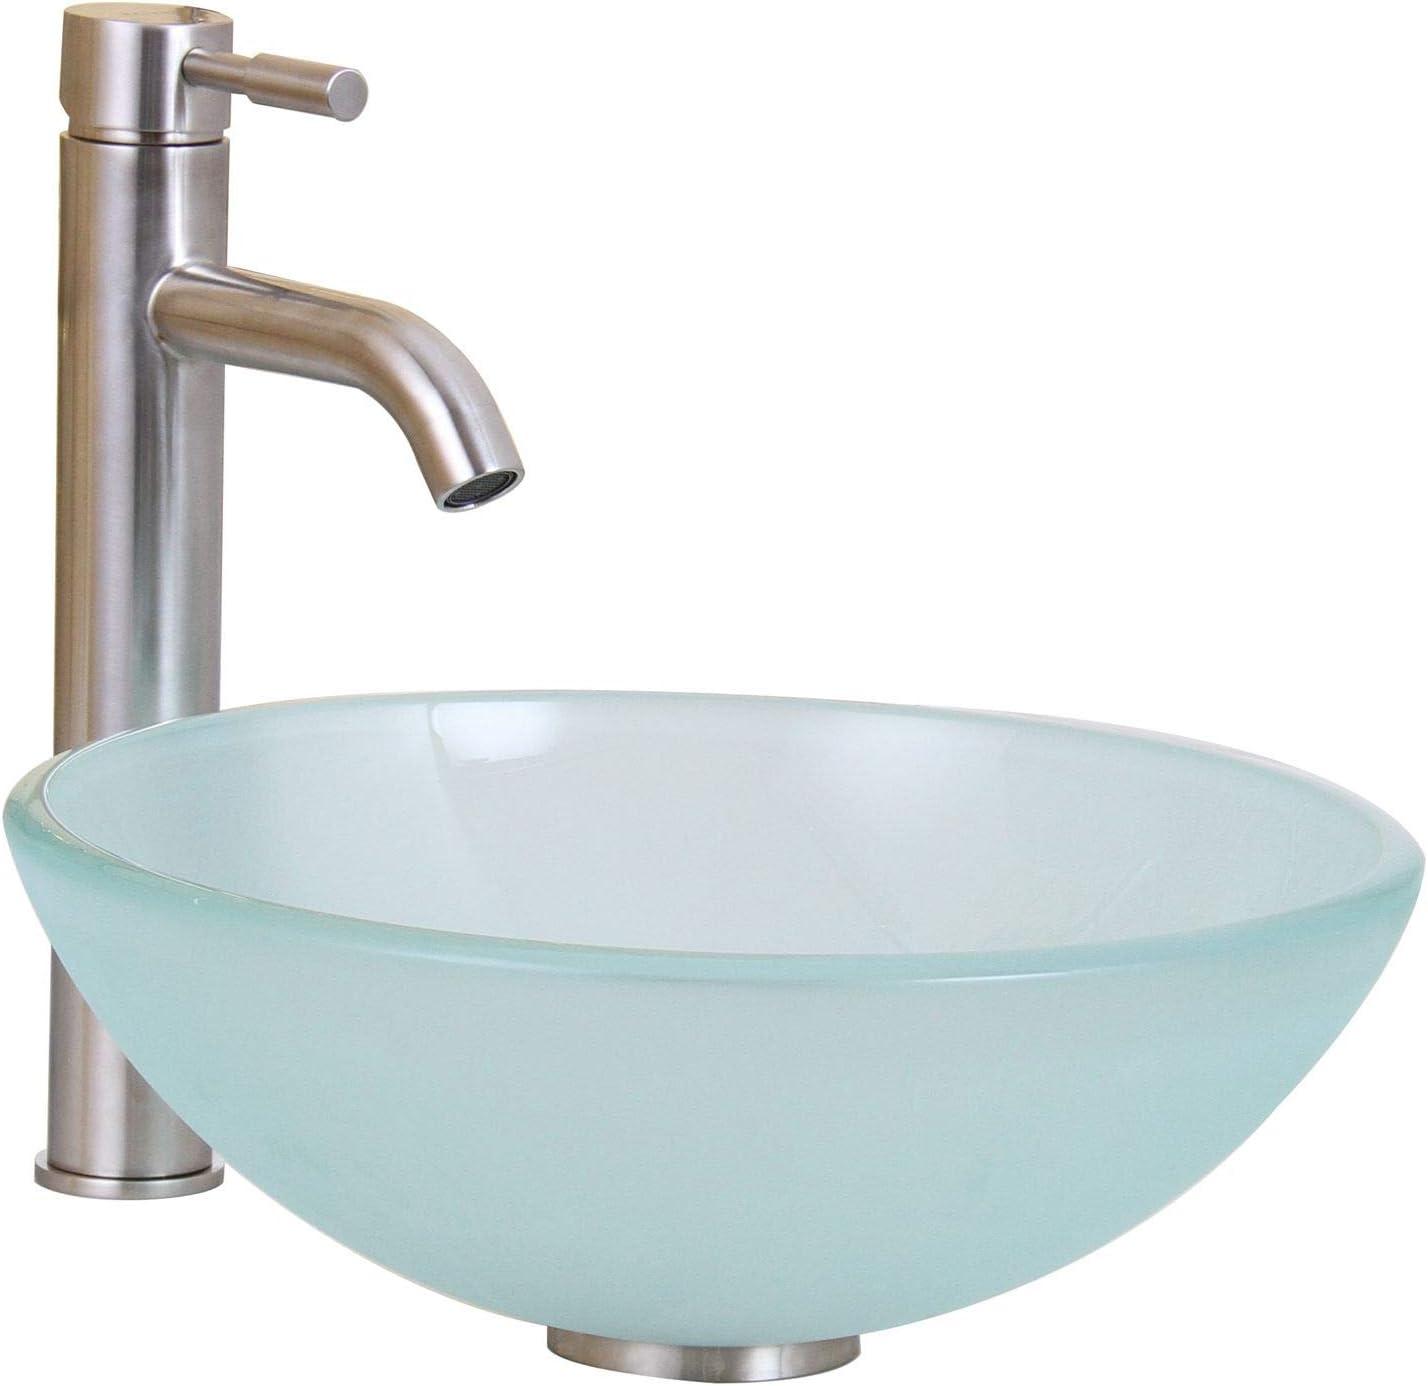 ELITE Tempered Bathroom 14 Frosted Glass Vessel Sink Brushed Nickel Faucet